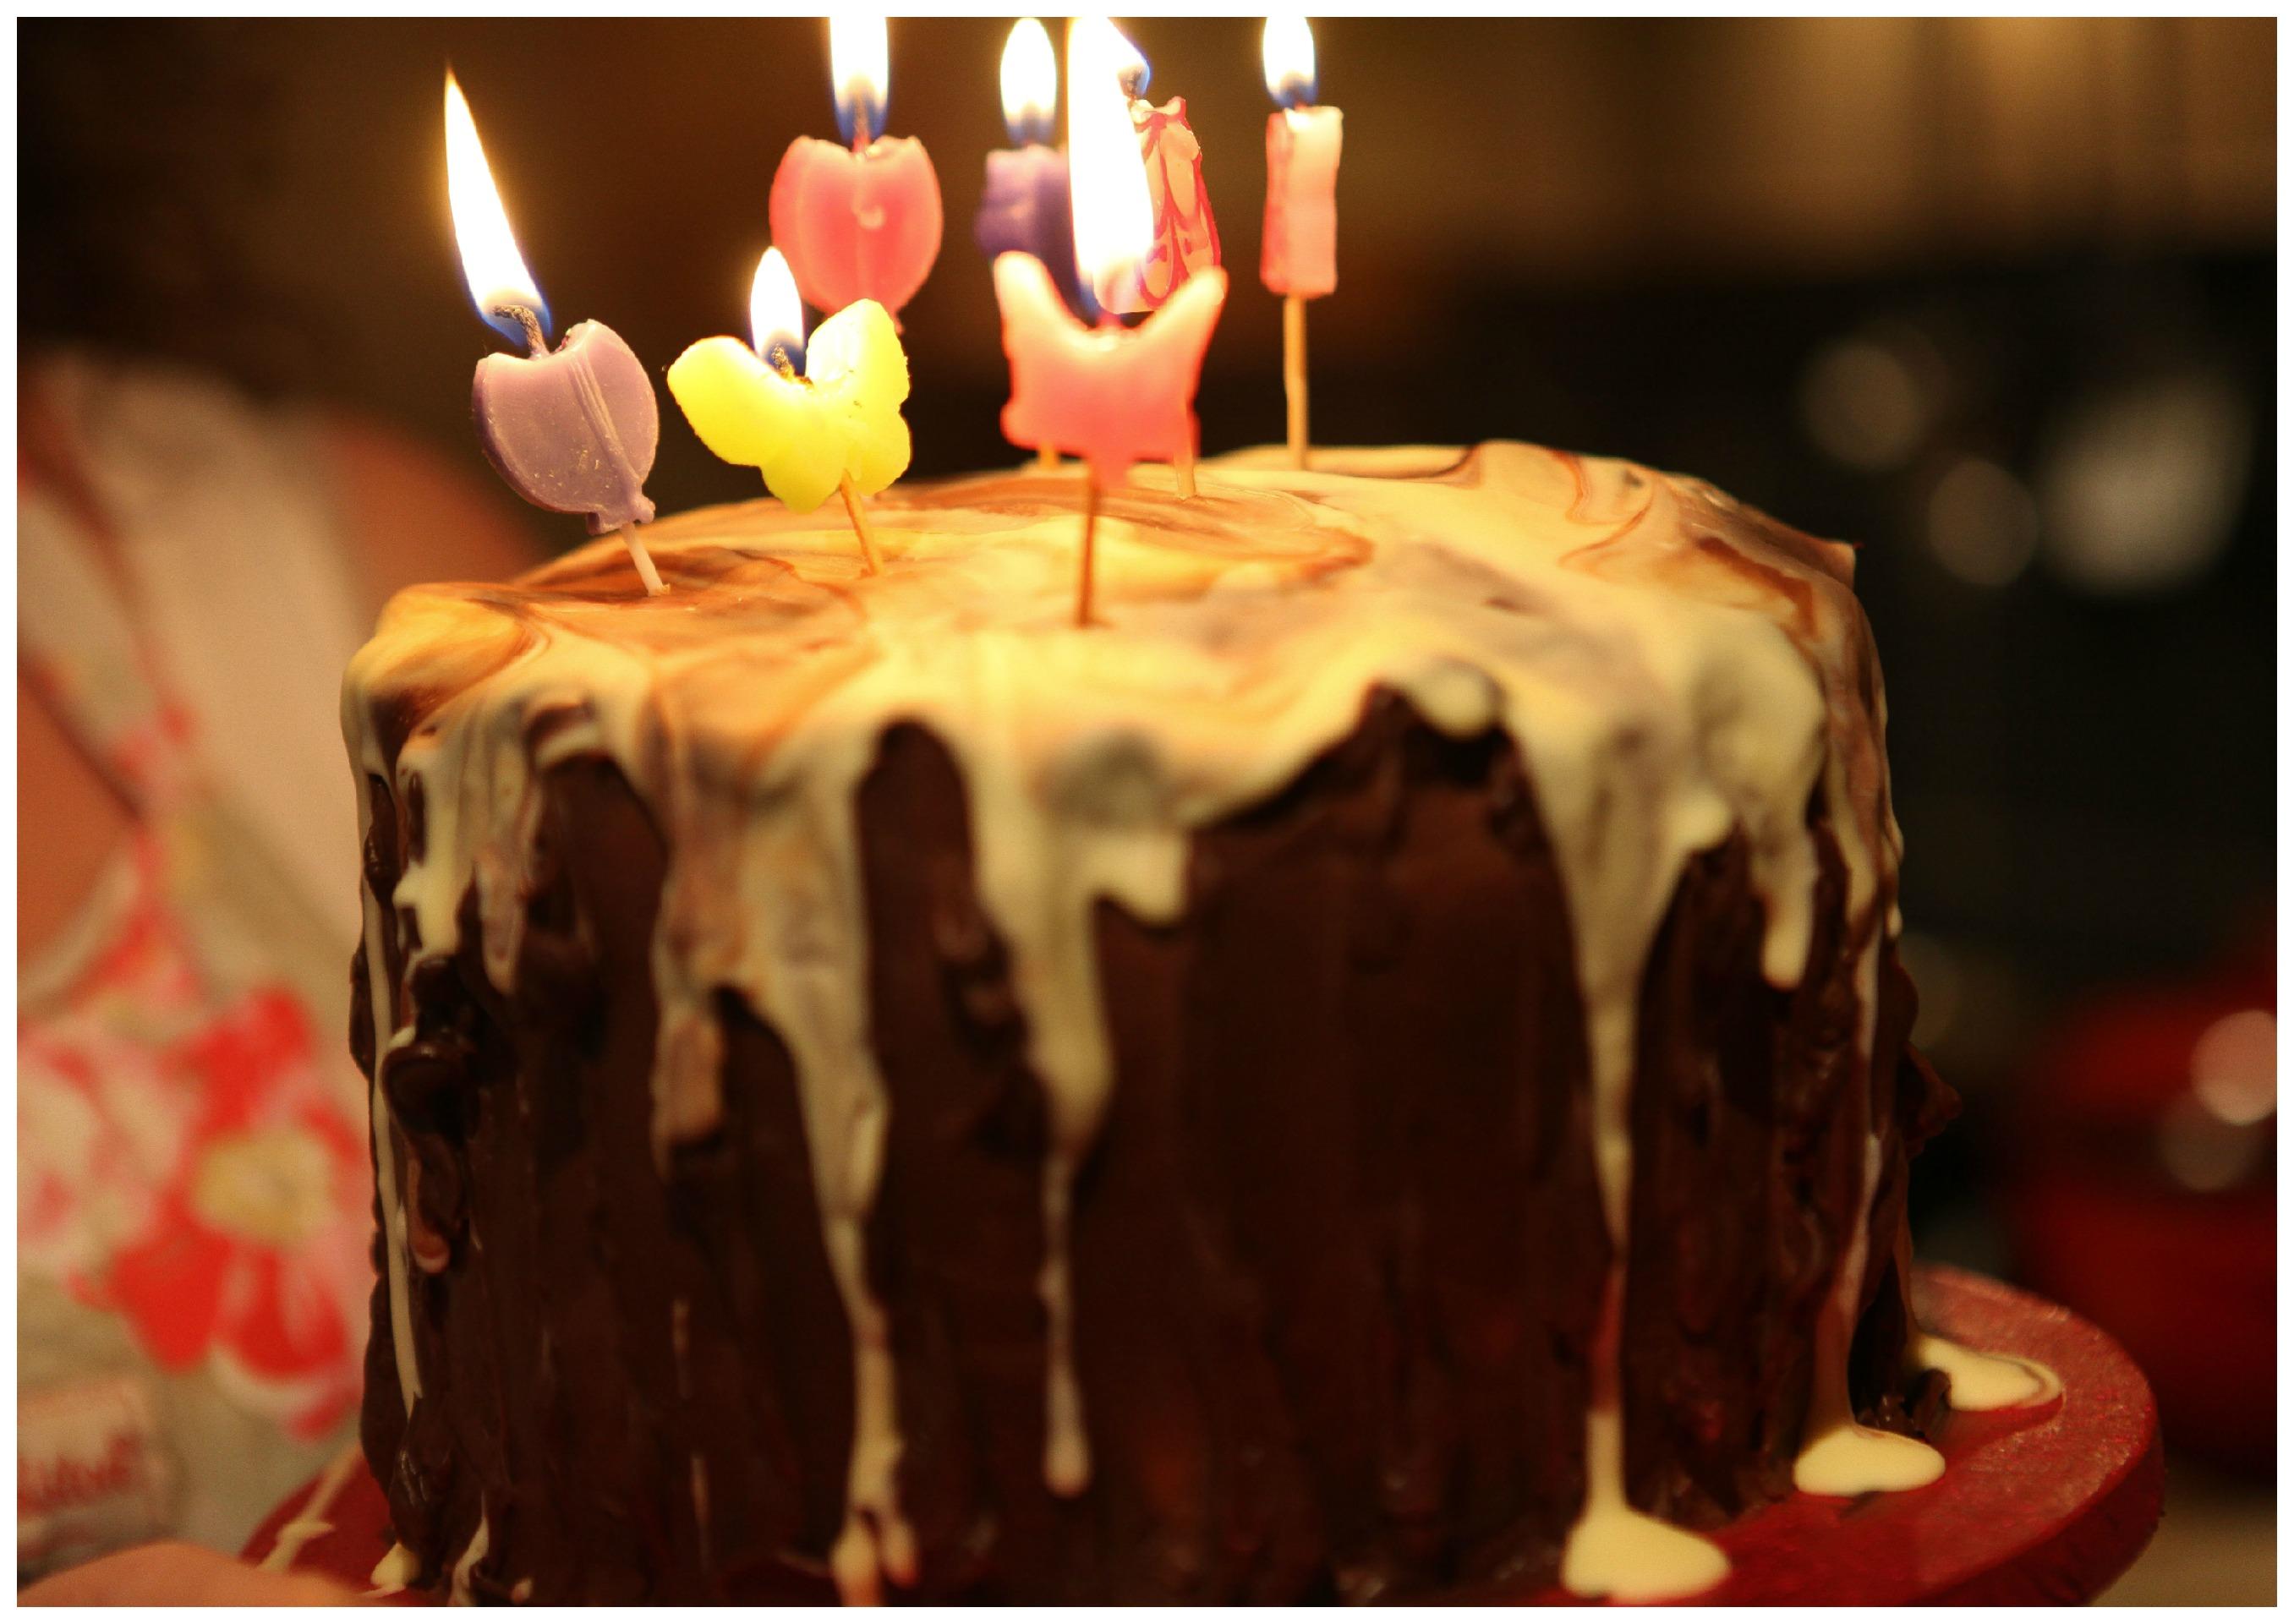 Primrose Bakery Chocolate Cake Gluten Free VO81choccake5a